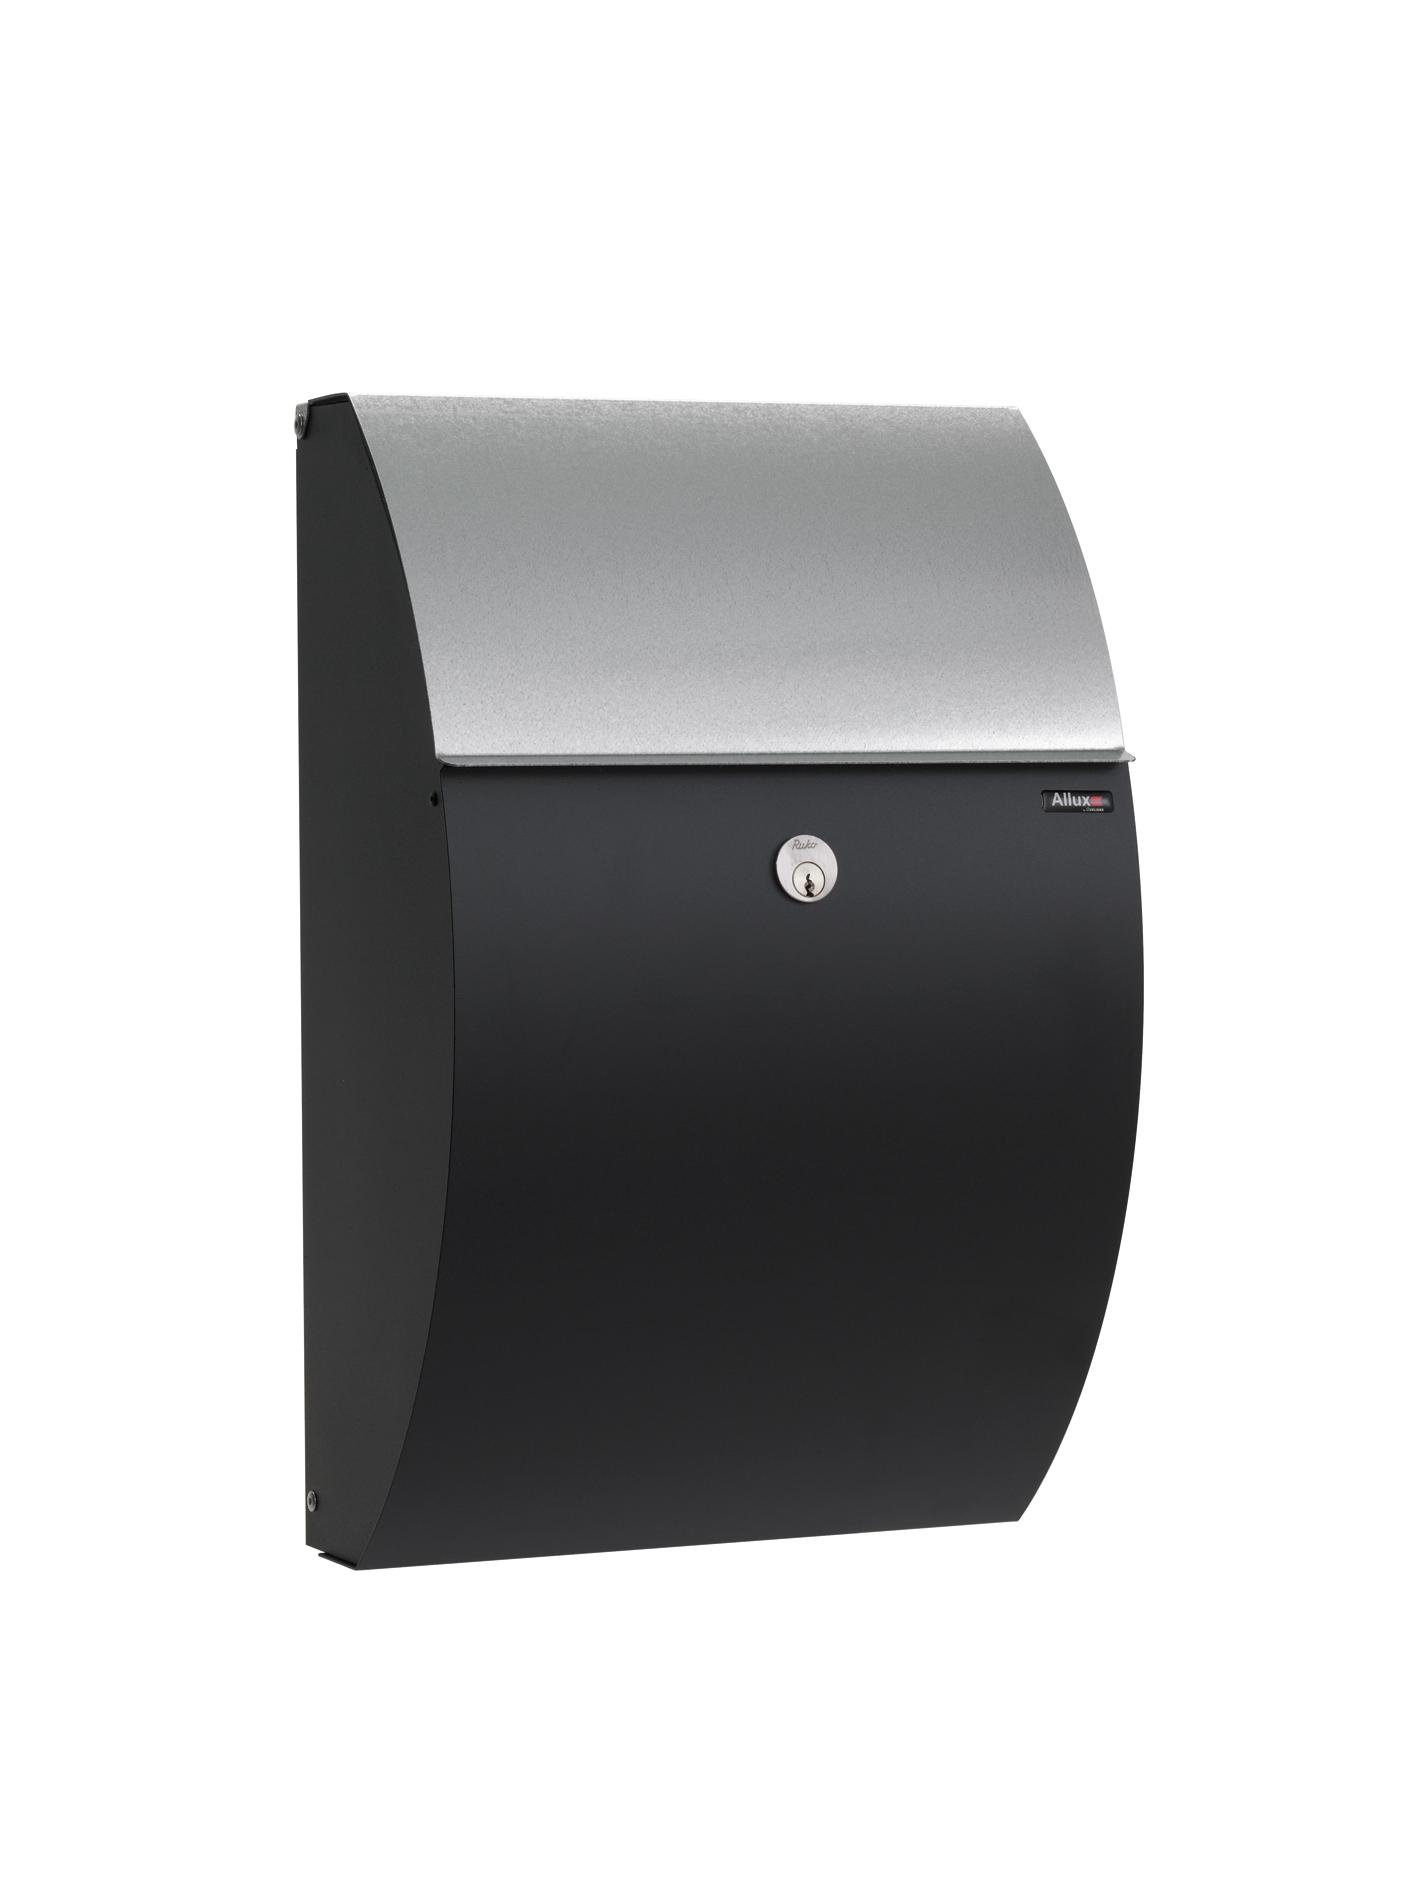 Allux 7000 Locking Wall Mount Mailbox